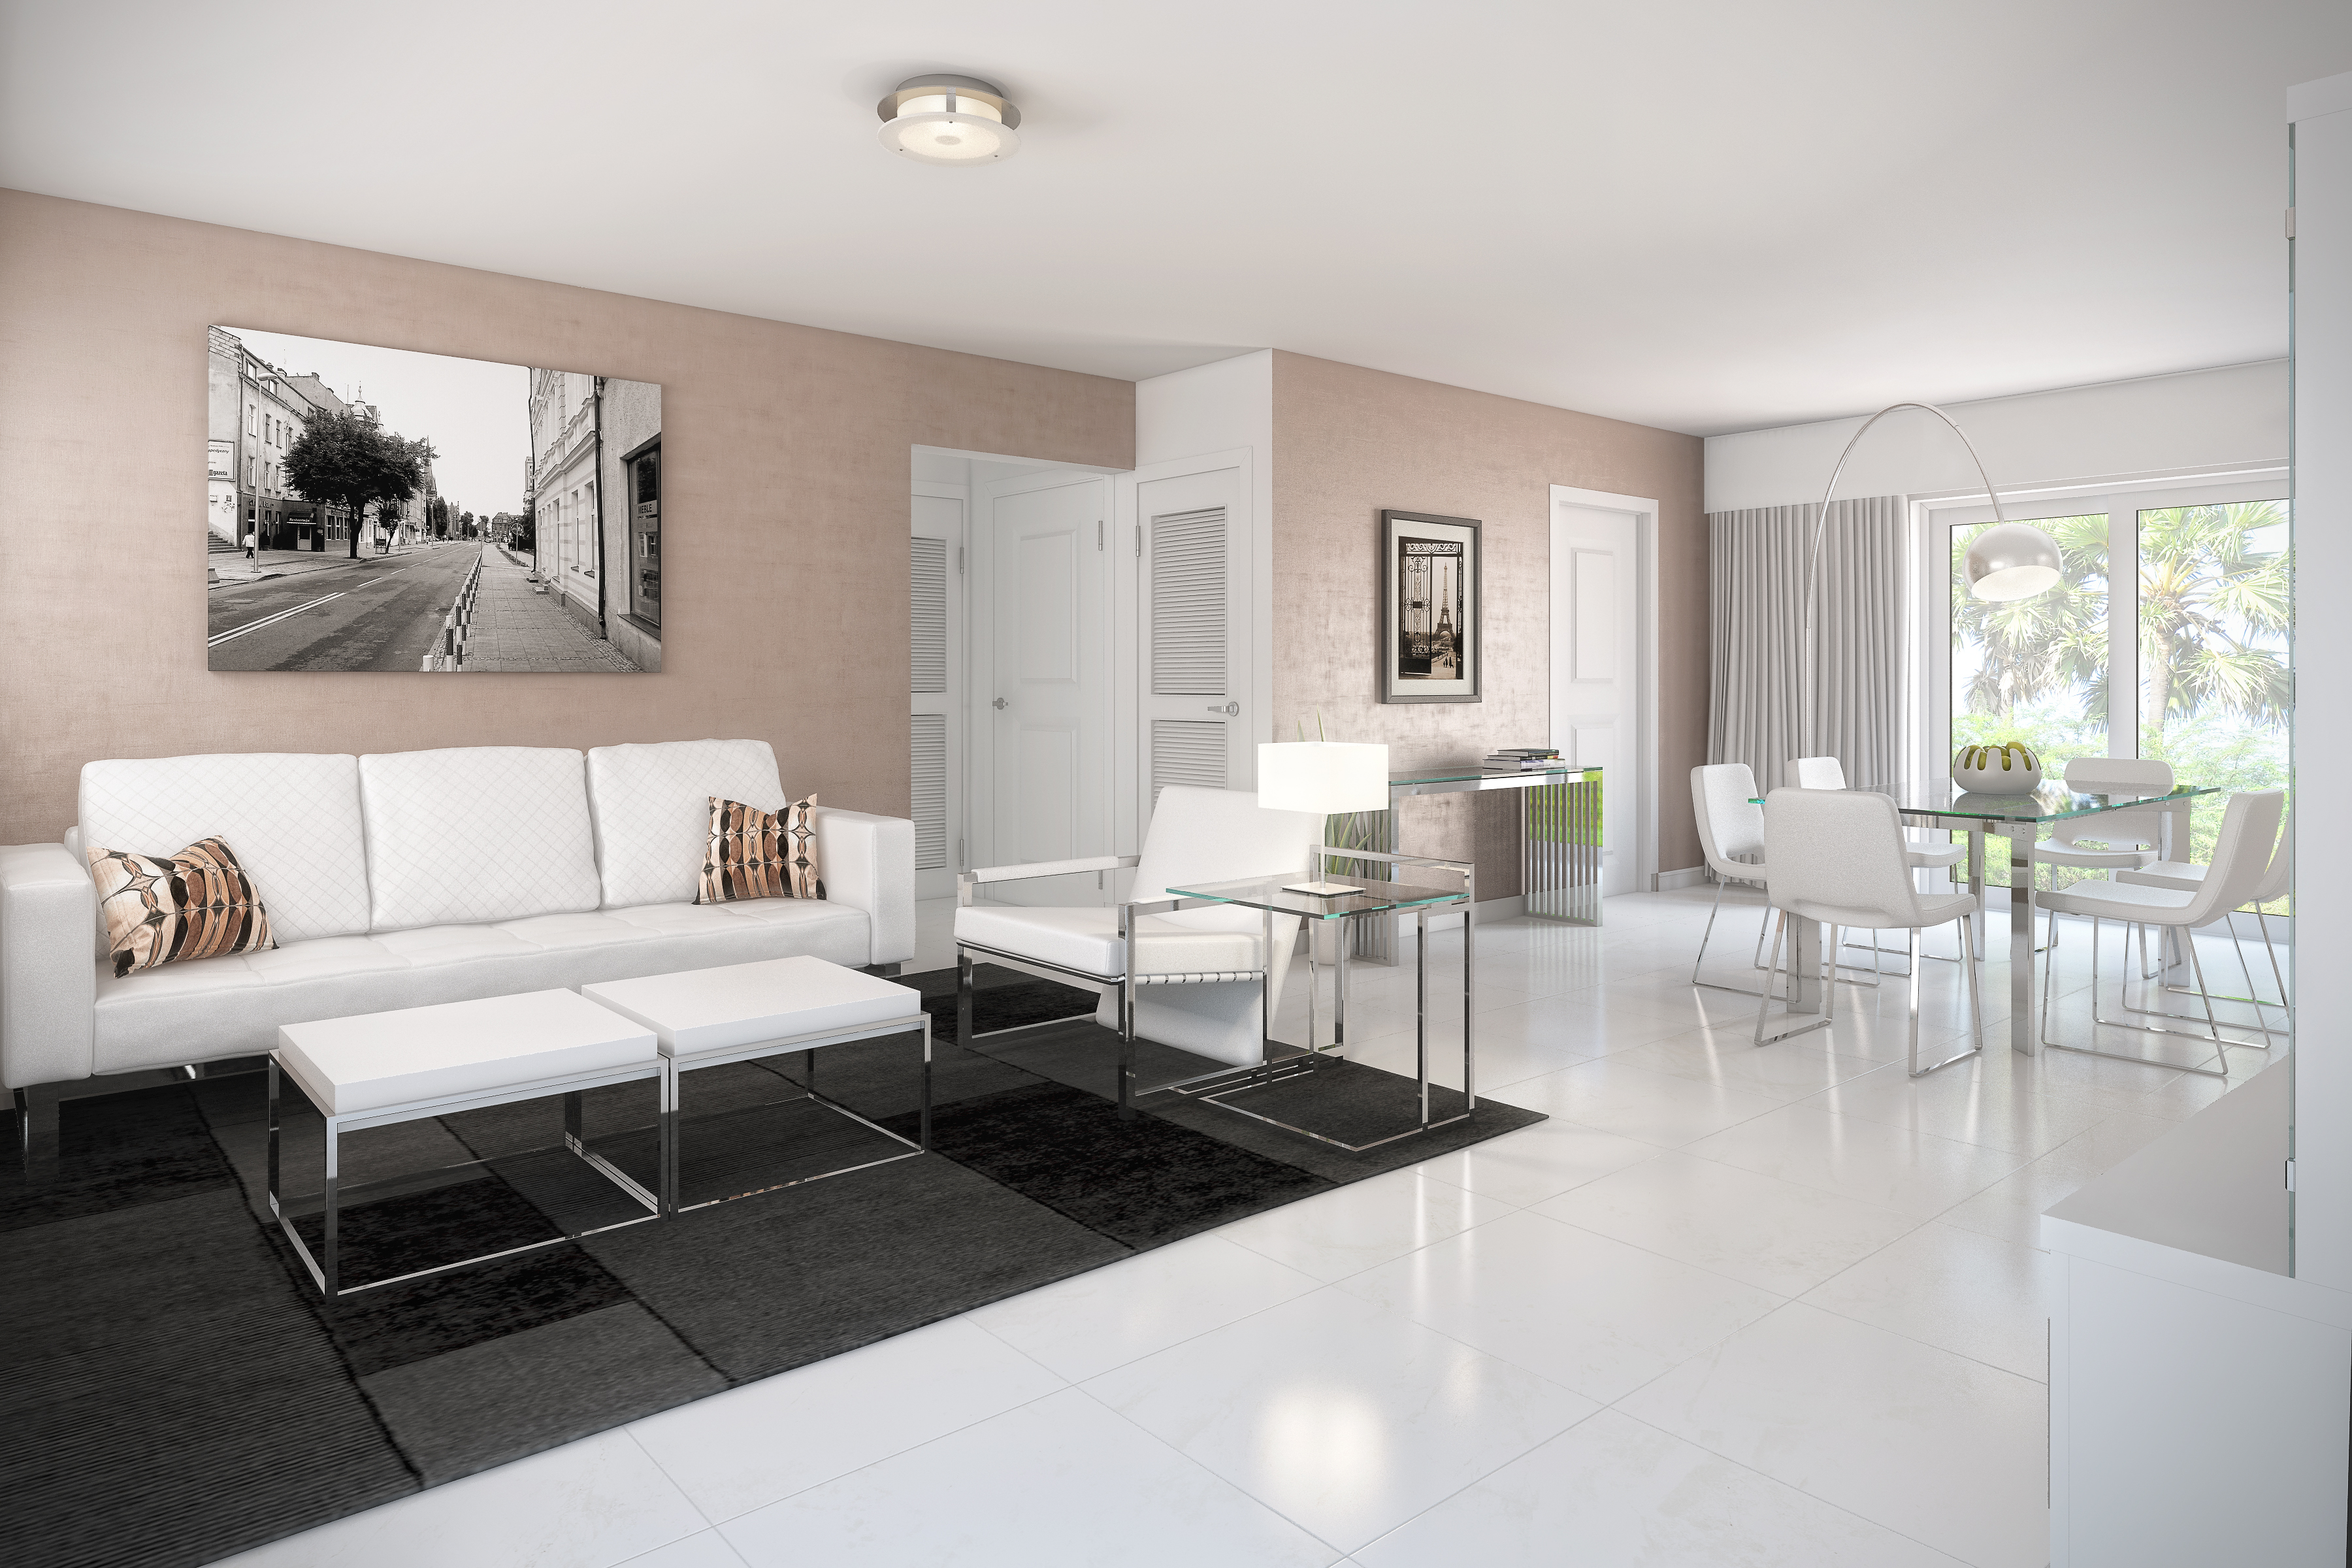 Innovative unit 302 living room 01